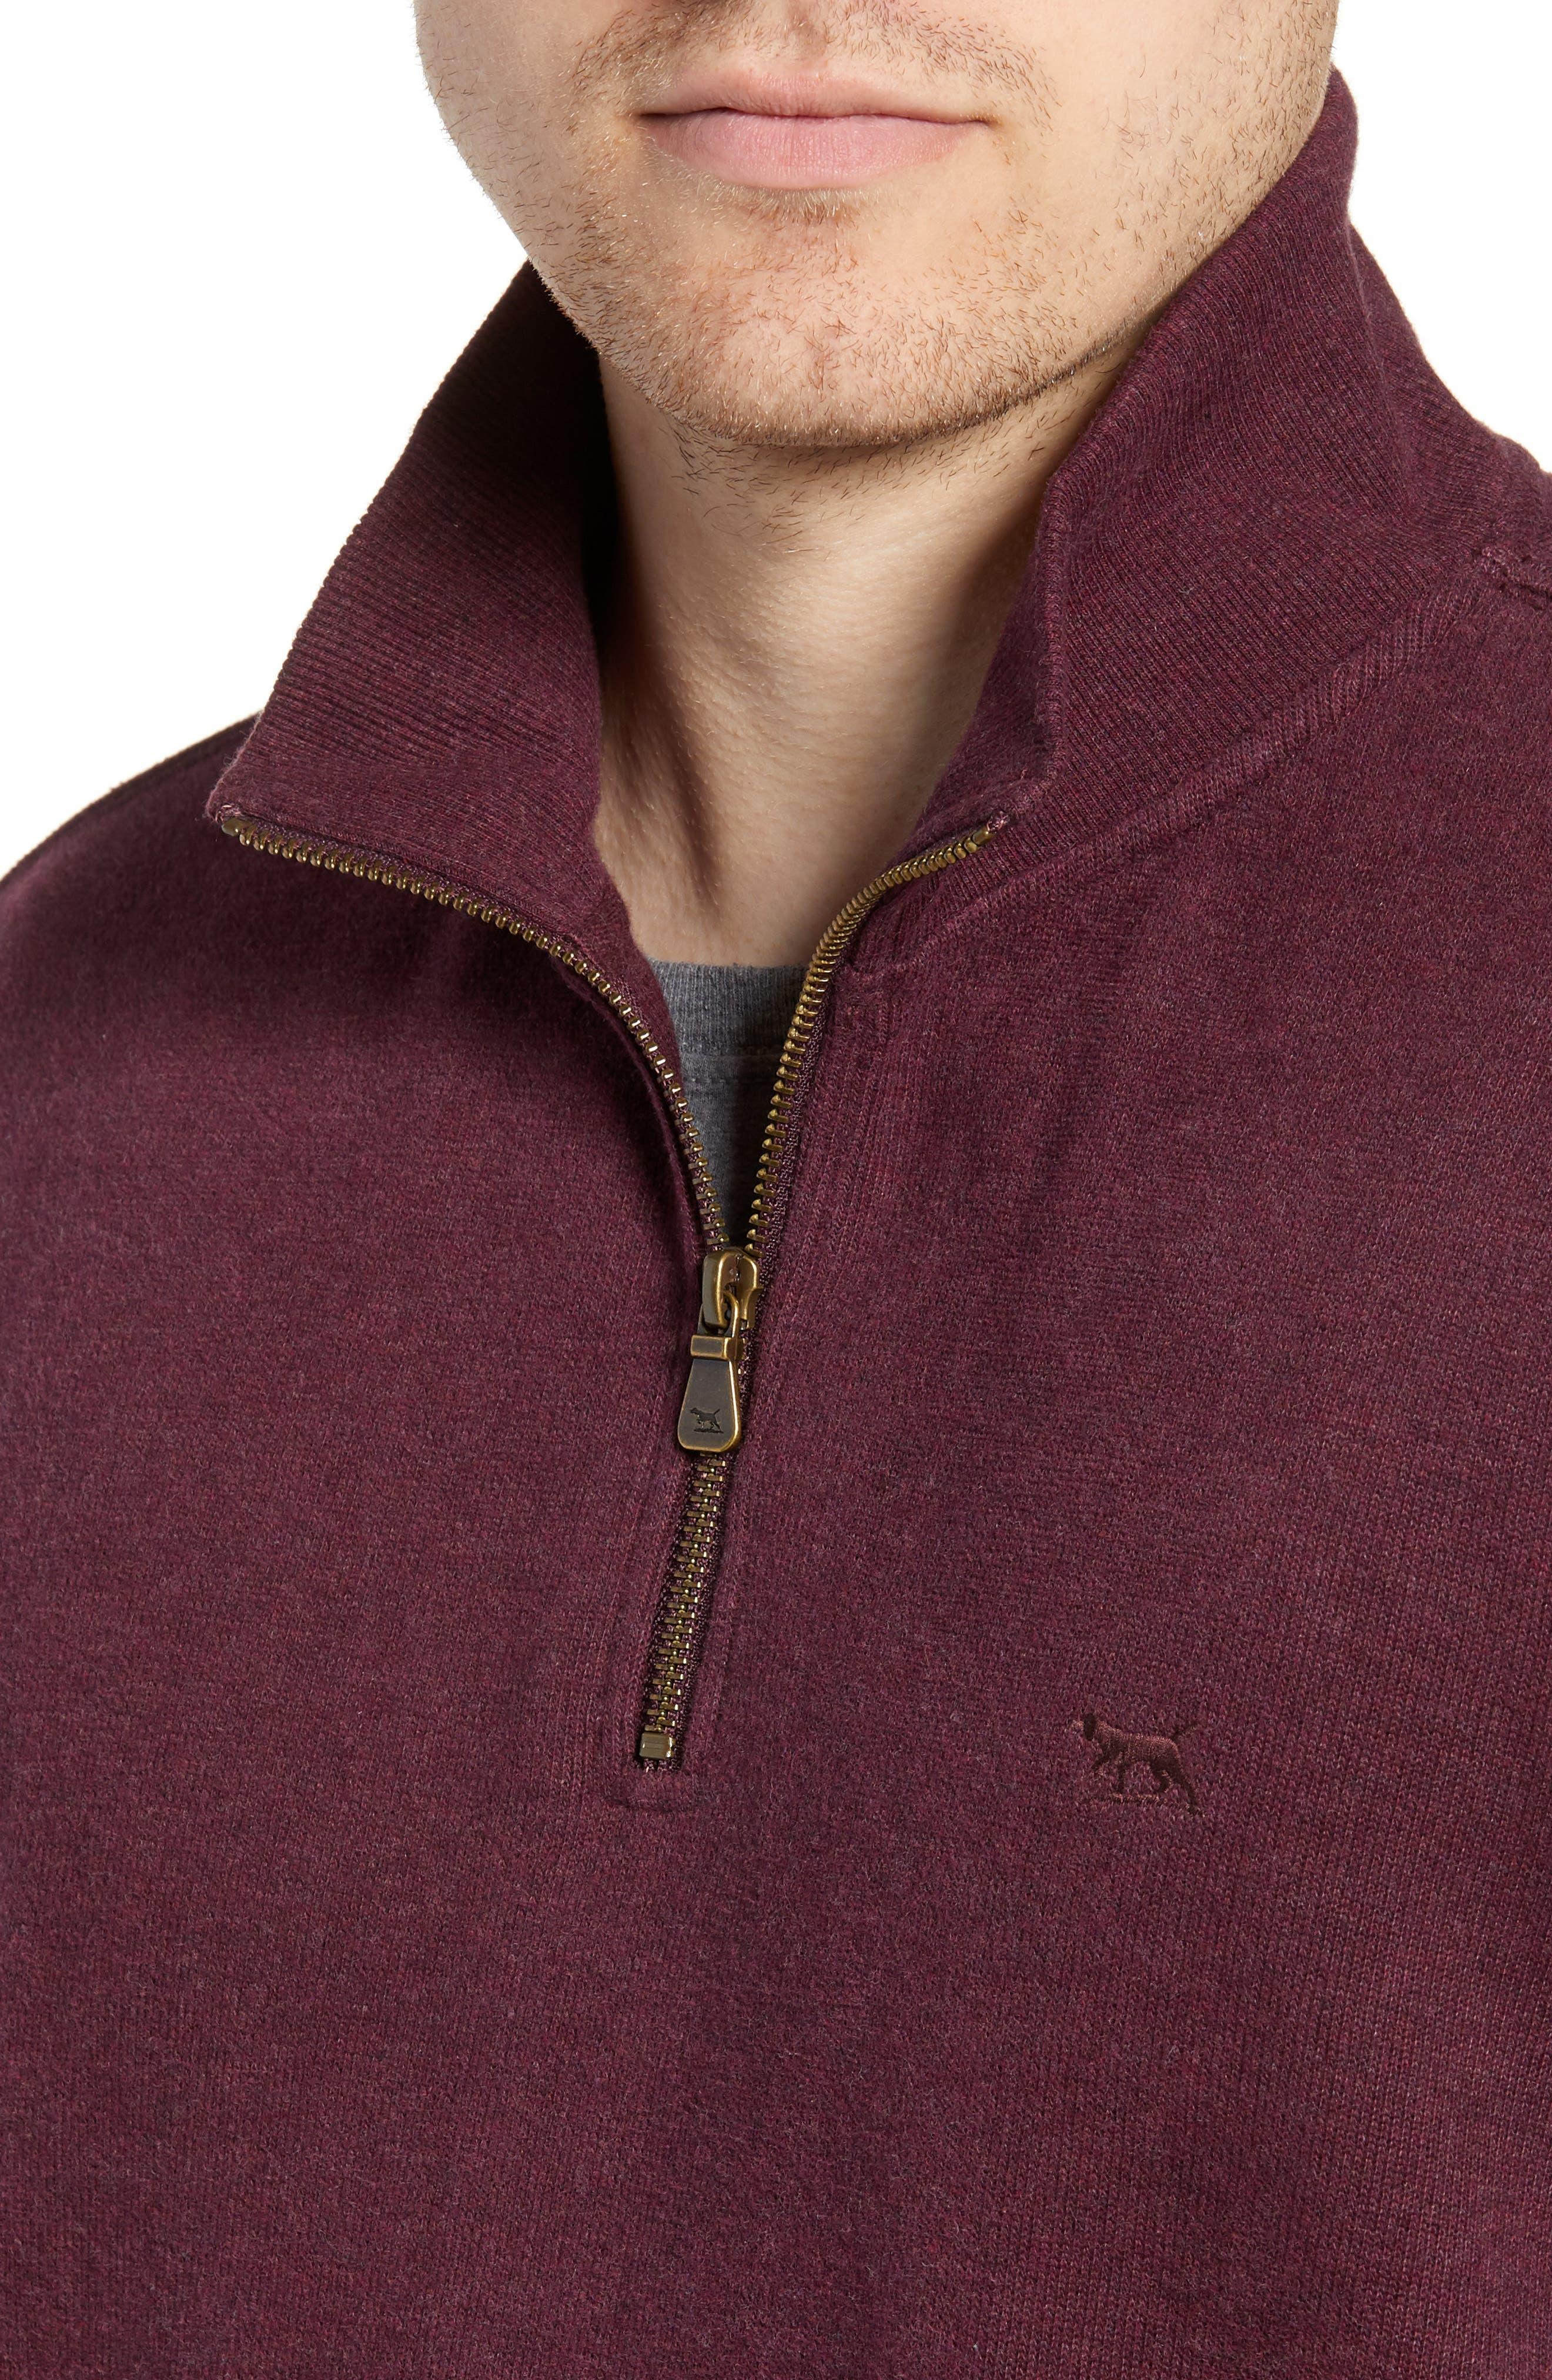 RODD & GUNN, Alton Ave Regular Fit Pullover Sweatshirt, Alternate thumbnail 4, color, BURGUNDY